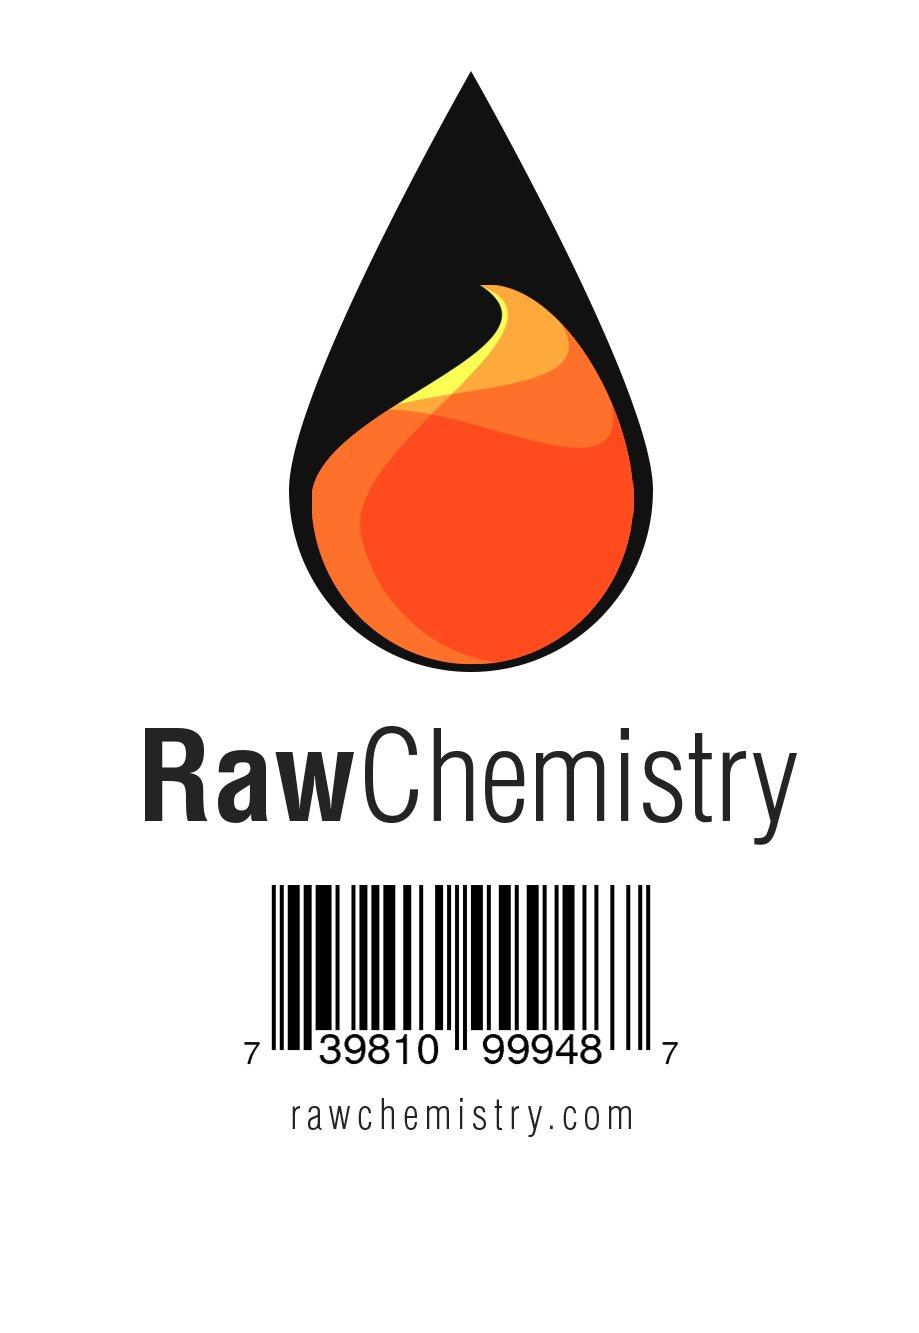 RawChemistry Pheromones For Men Pheromone Cologne Oil [Attract Women] - Bold, Extra Strength